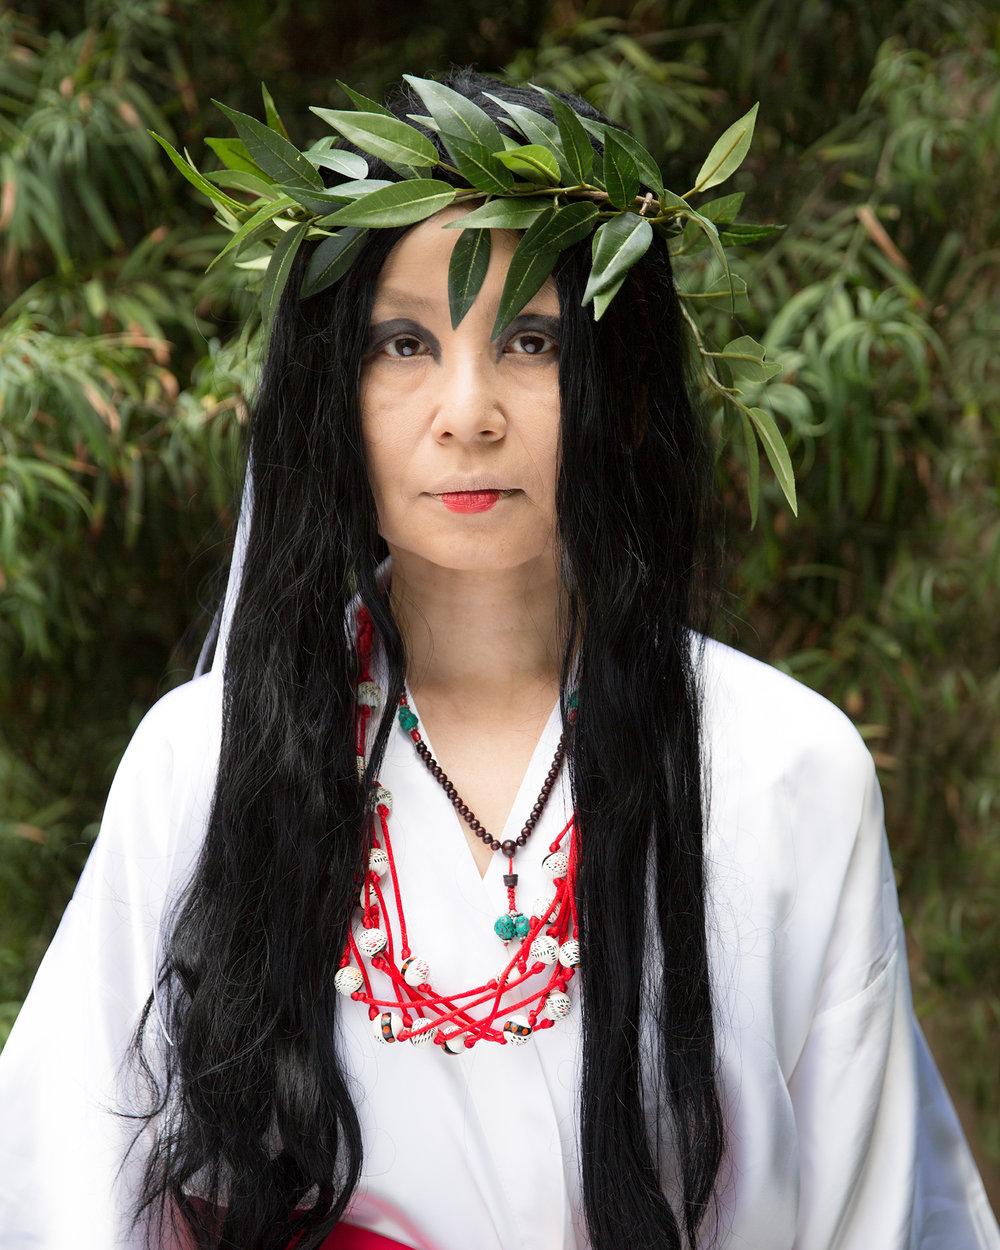 Michiko Yao as Himiko